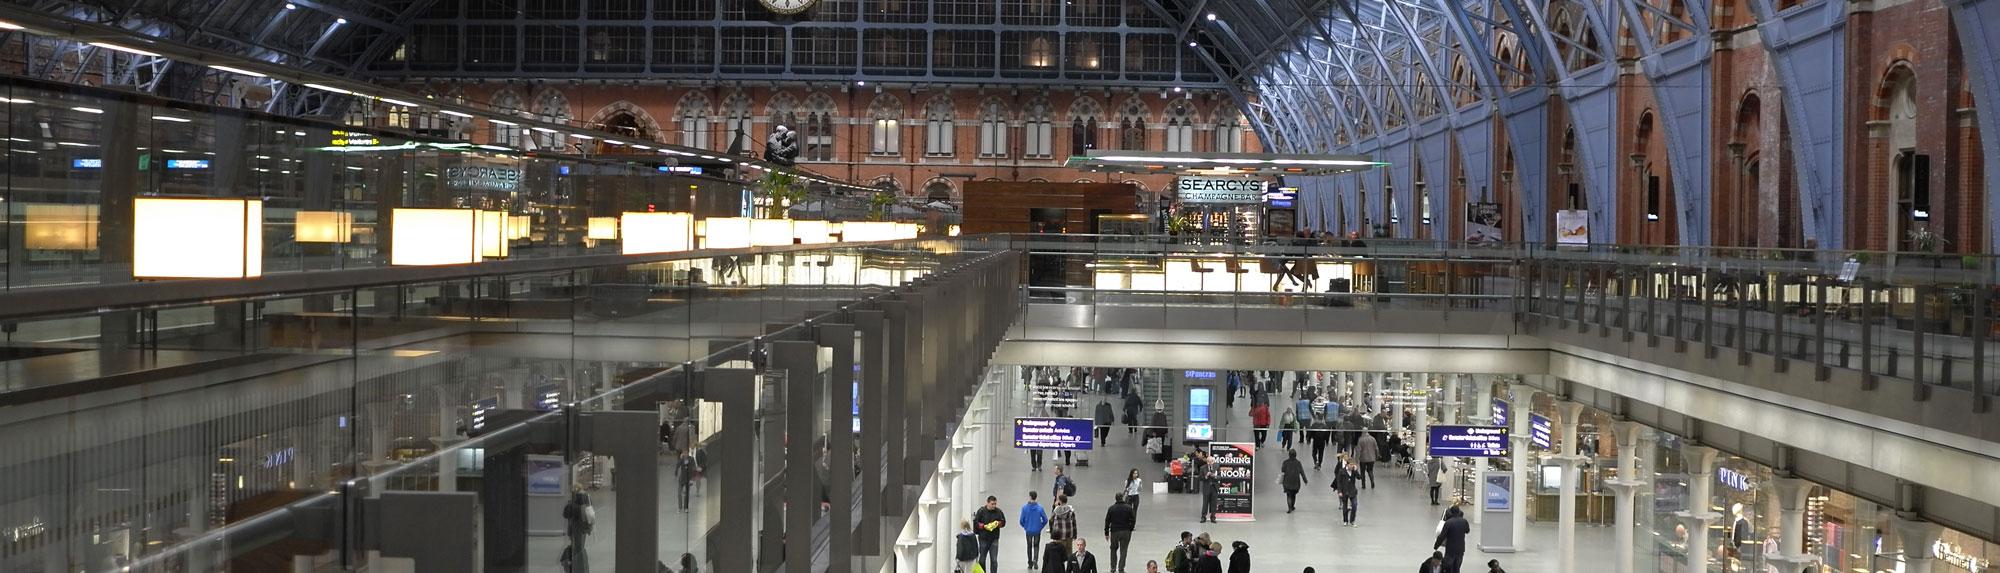 StPancras-station_London2